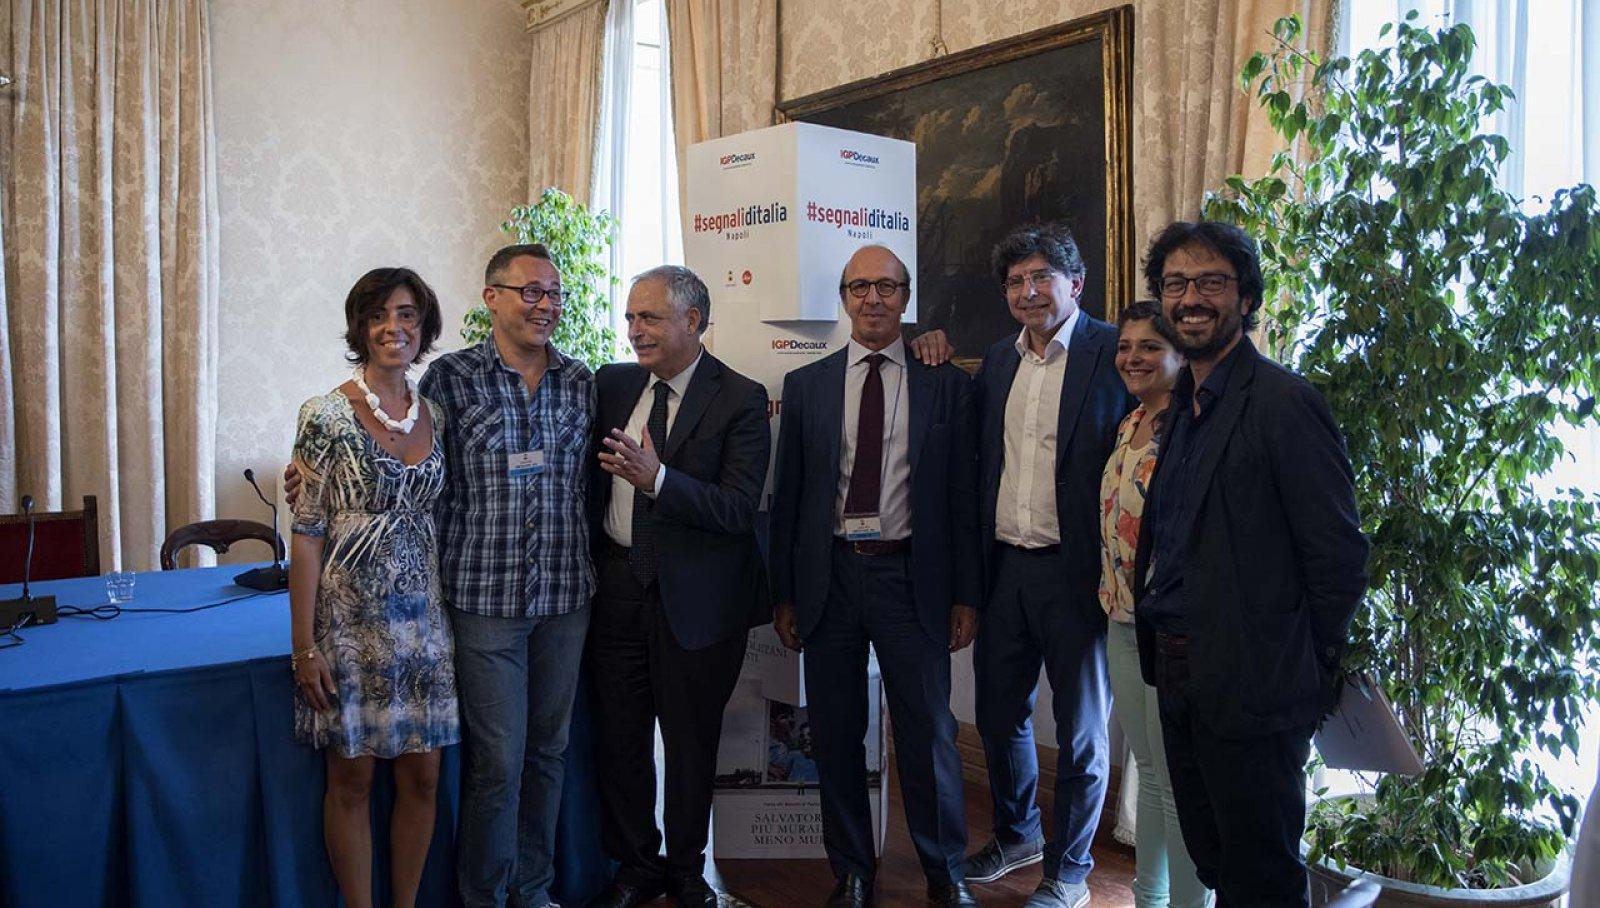 Segnali_D'Italia_campagna_Napoli_2018_IGPDecaux